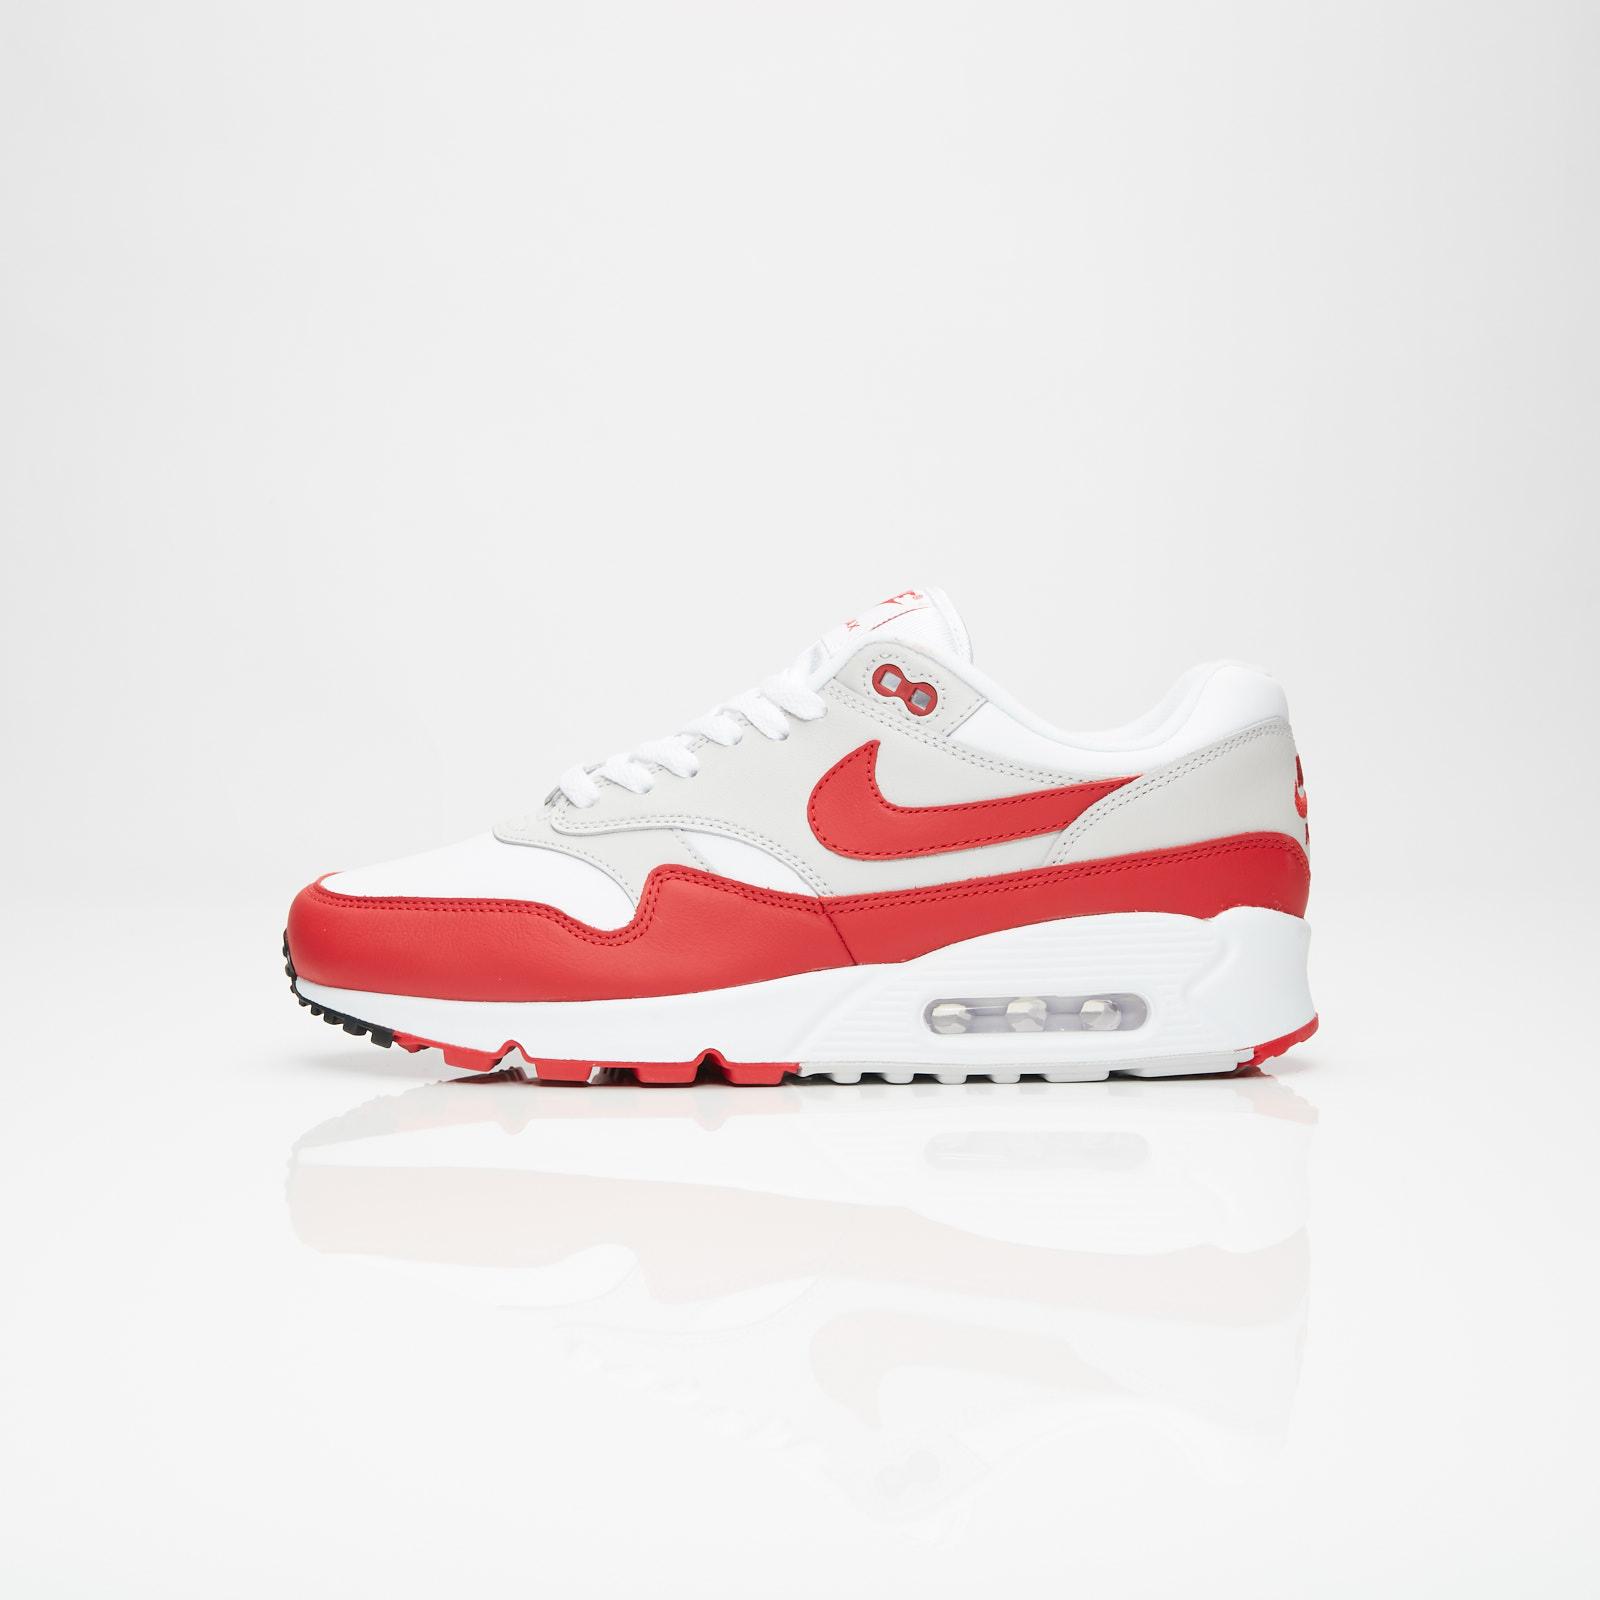 eea8fda24 Nike Air Max 90/1 - Aj7695-100 - Sneakersnstuff | sneakers & streetwear  online since 1999